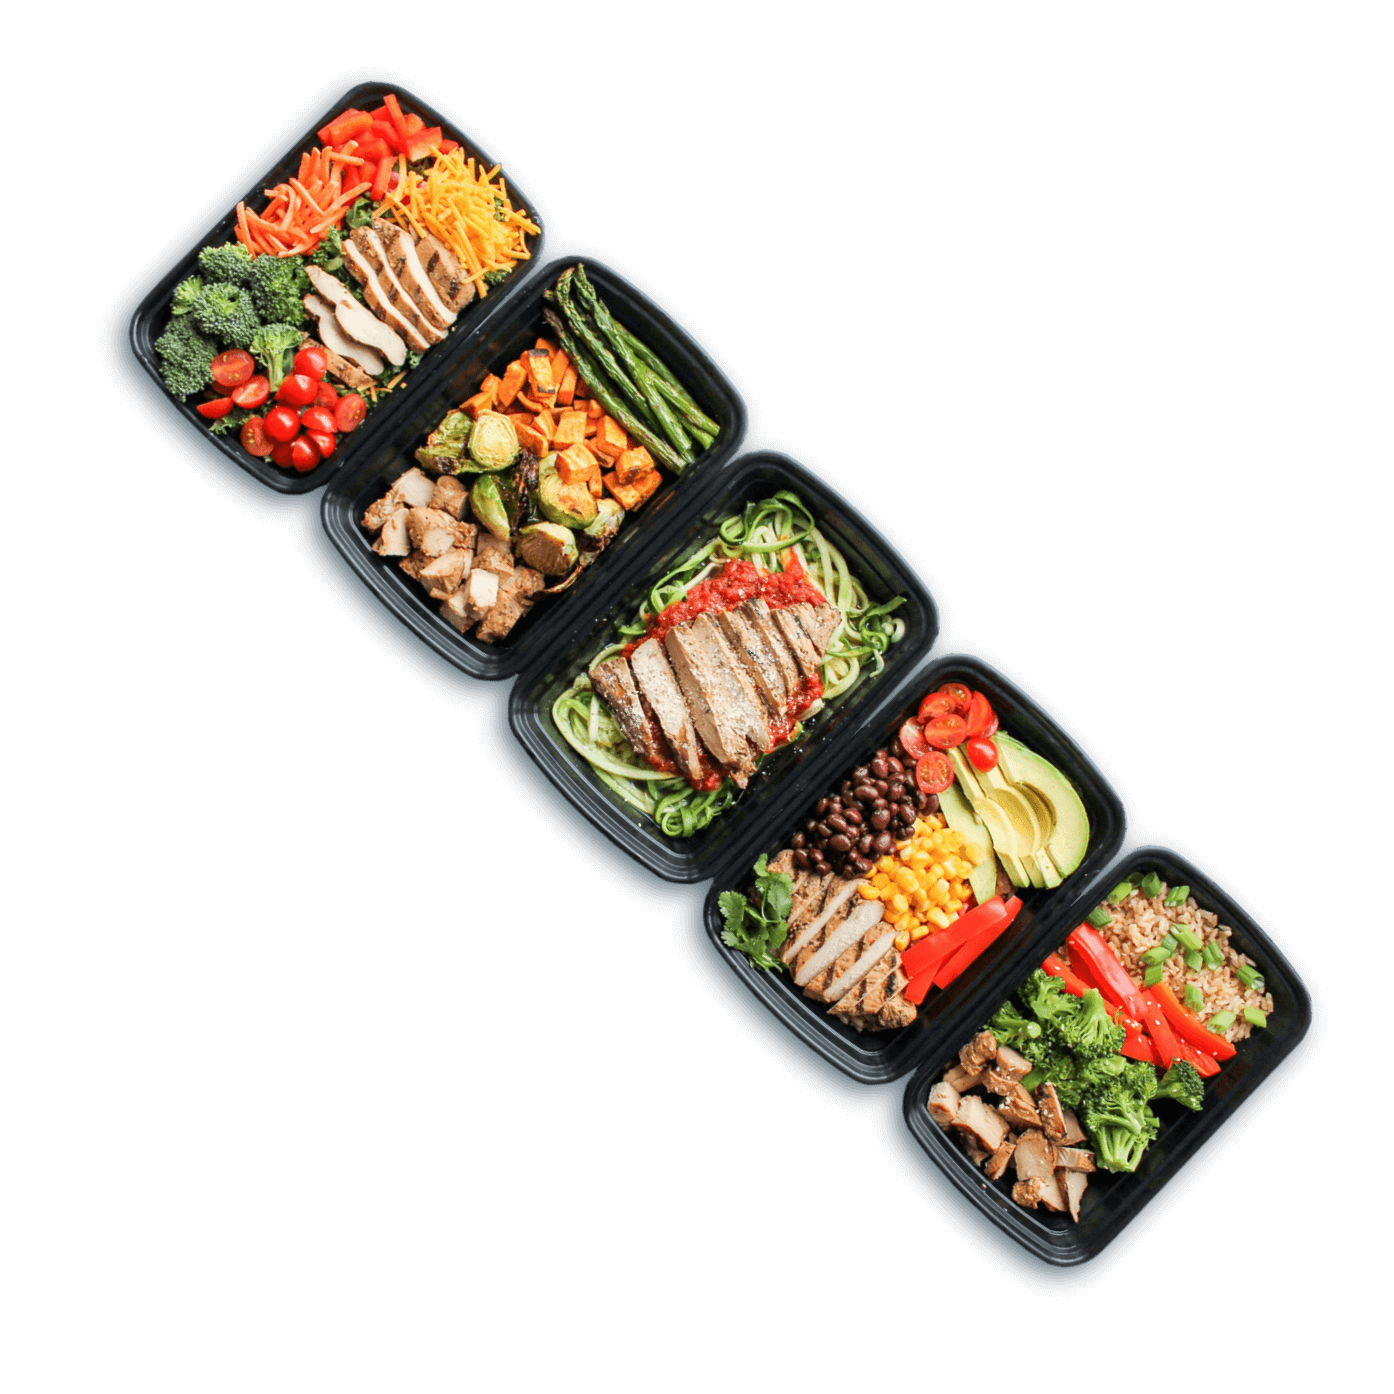 Takeaway Boxes Healthy Takeaway Order Healthy Takeaway Online Order Healthy Food Box Healthy Food Subscription Salad Boxes Order Ingredients Online Nutritious Takeaway